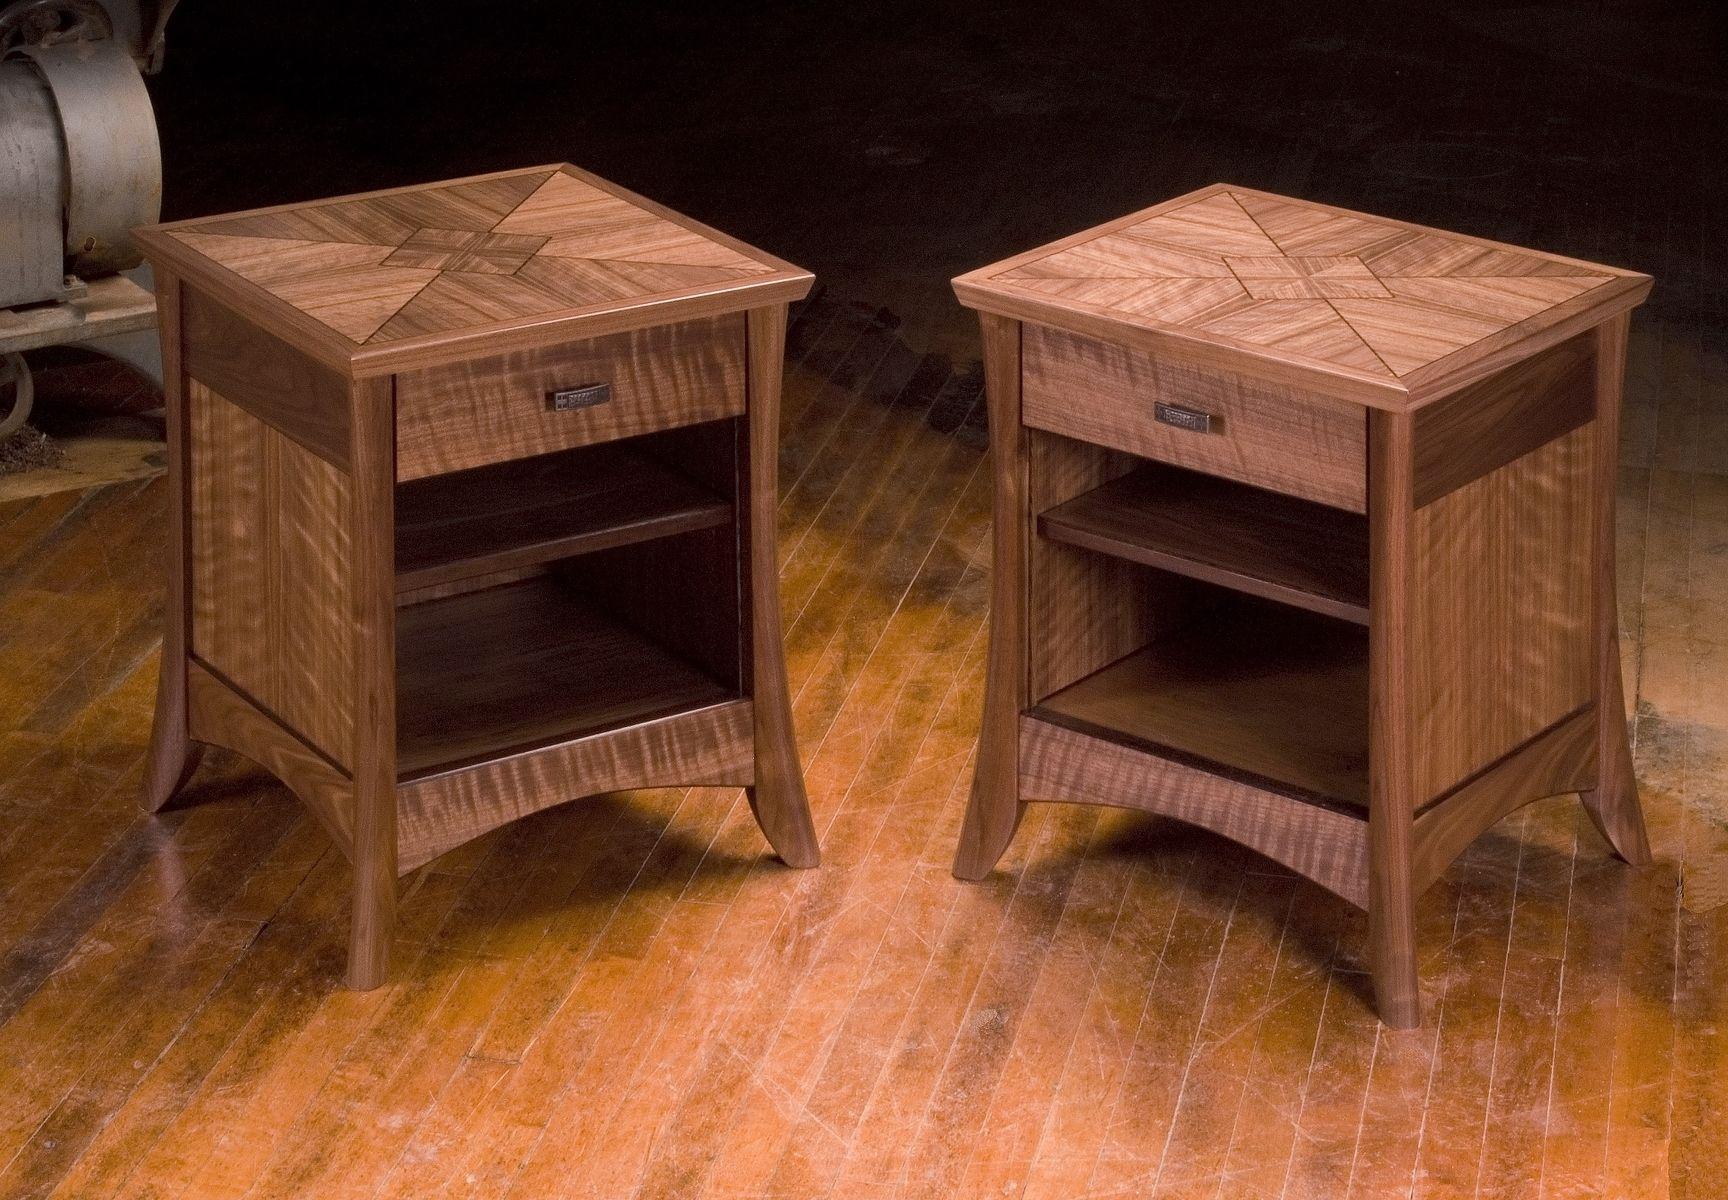 Night Stand Table Designs : Handmade walnut night stands by neal barrett woodworking